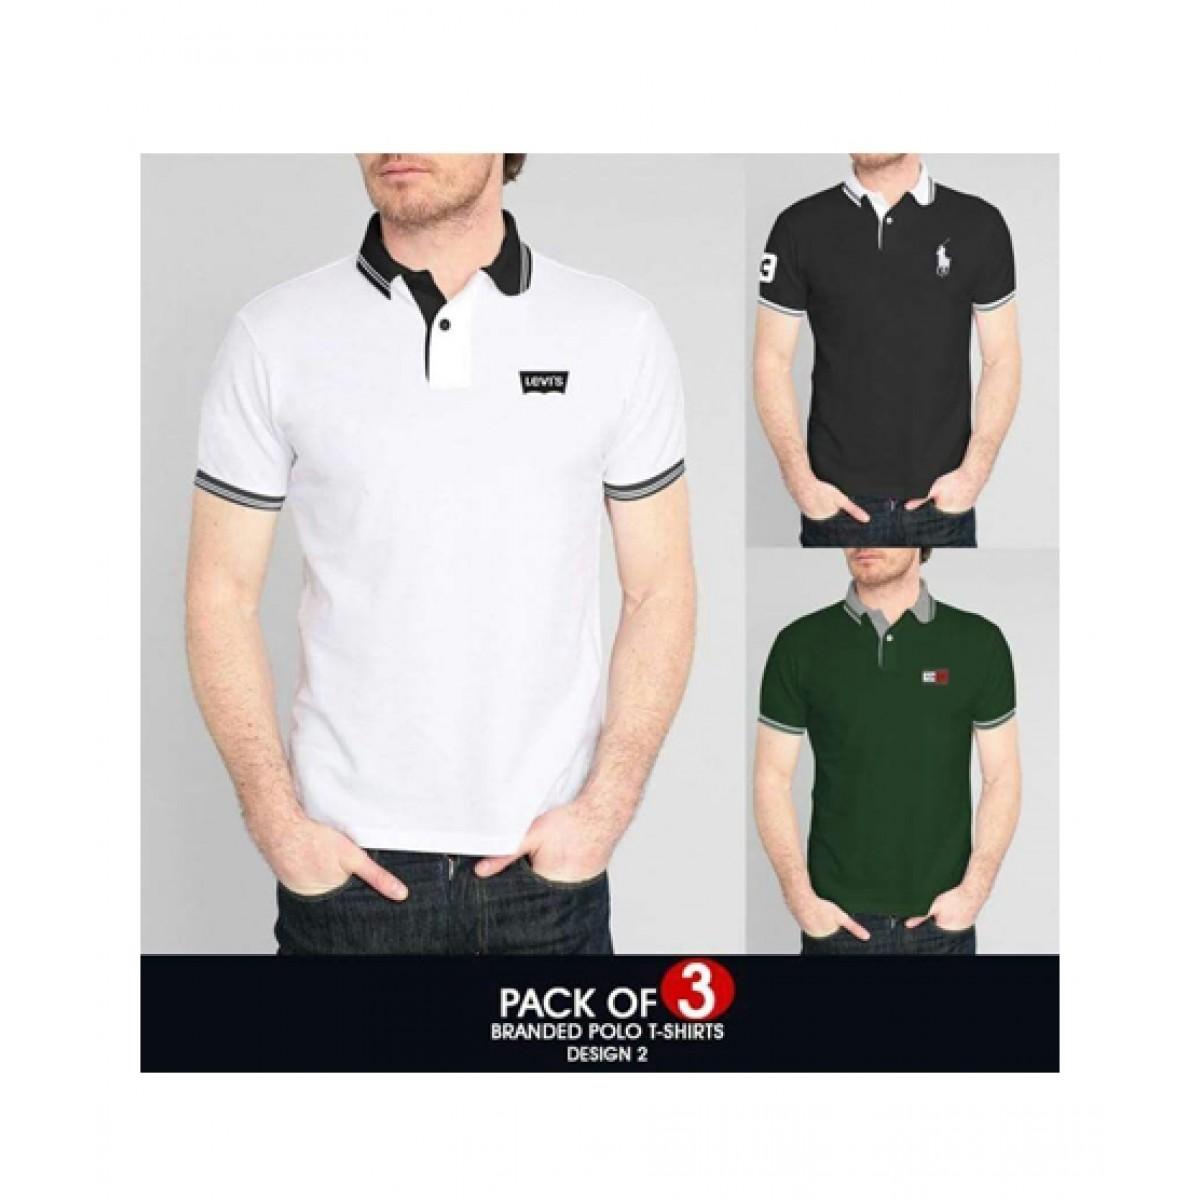 0d1840bf8 Polo T Shirts Deals - DREAMWORKS